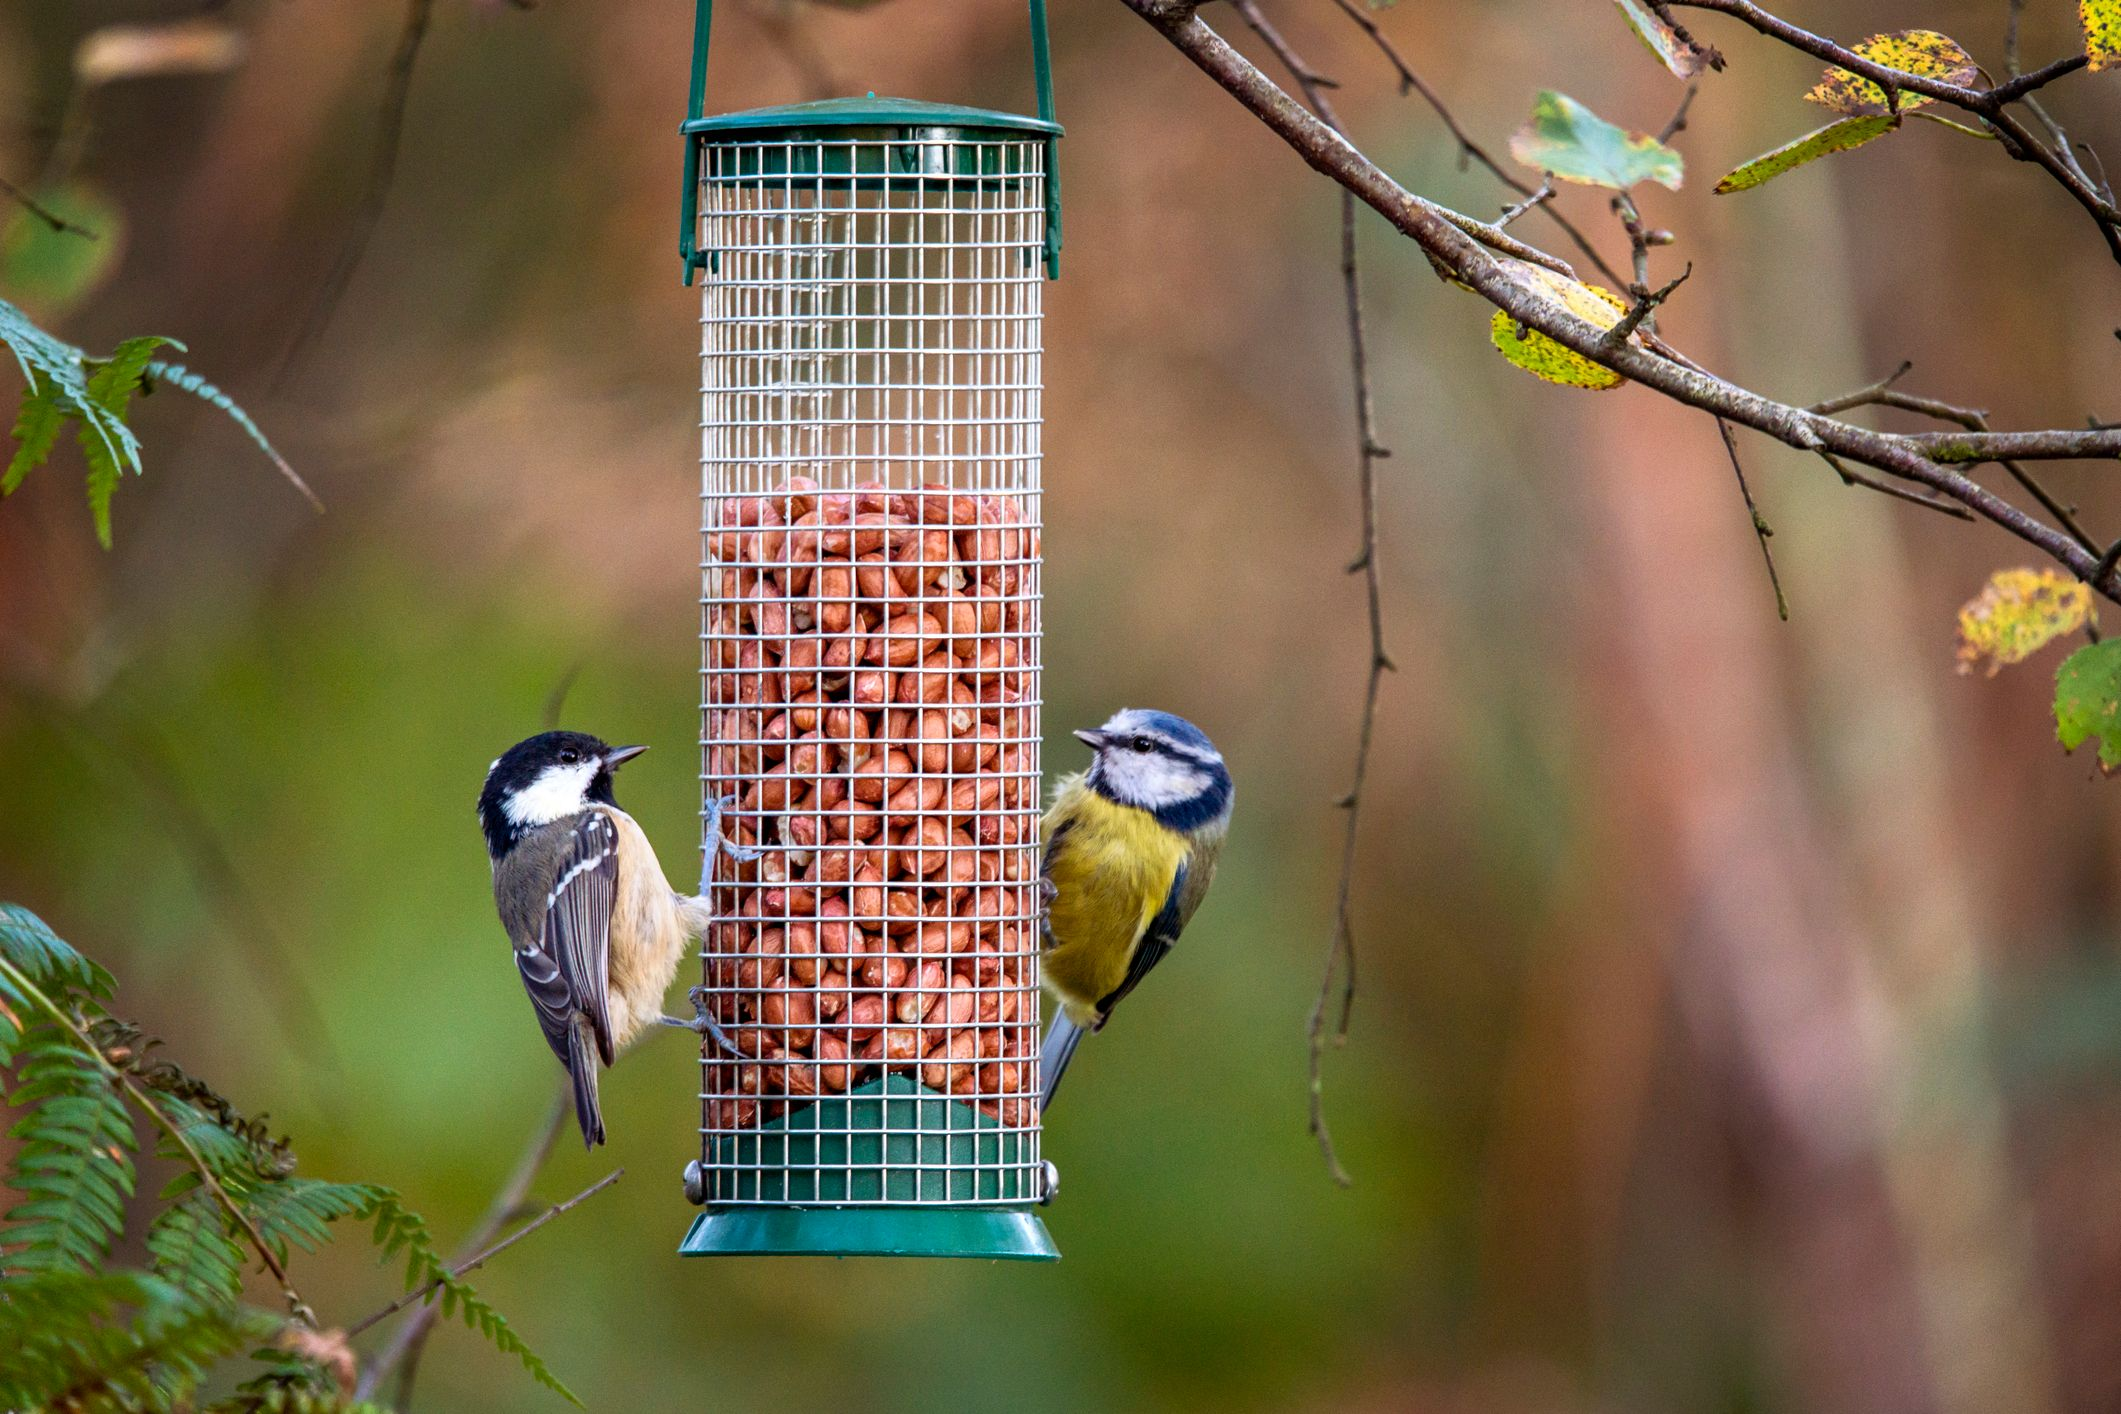 hang-bird-feeders-on-fences. 100+ Surprising Garden Design Ideas You Should Not Miss in 2021